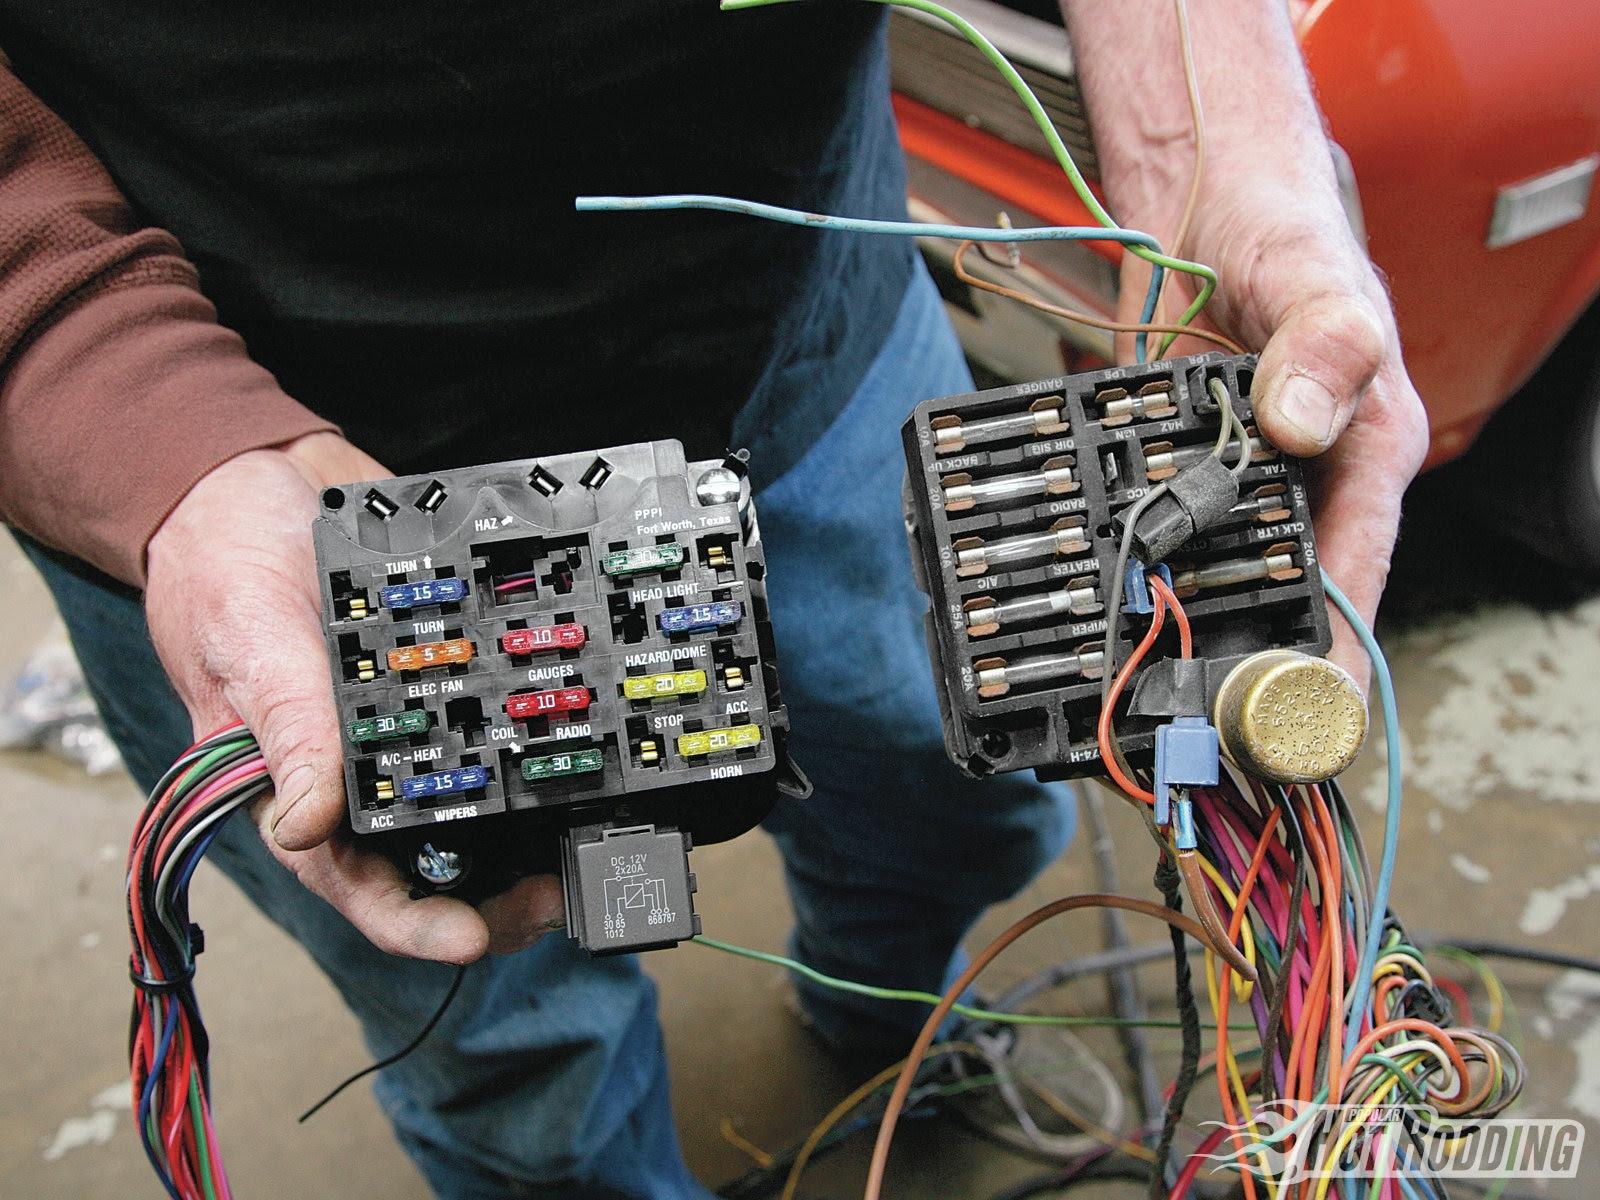 72 Nova Wiring Harness California Electric Guitar Ccd0095 Wiring Diagram Bege Wiring Diagram